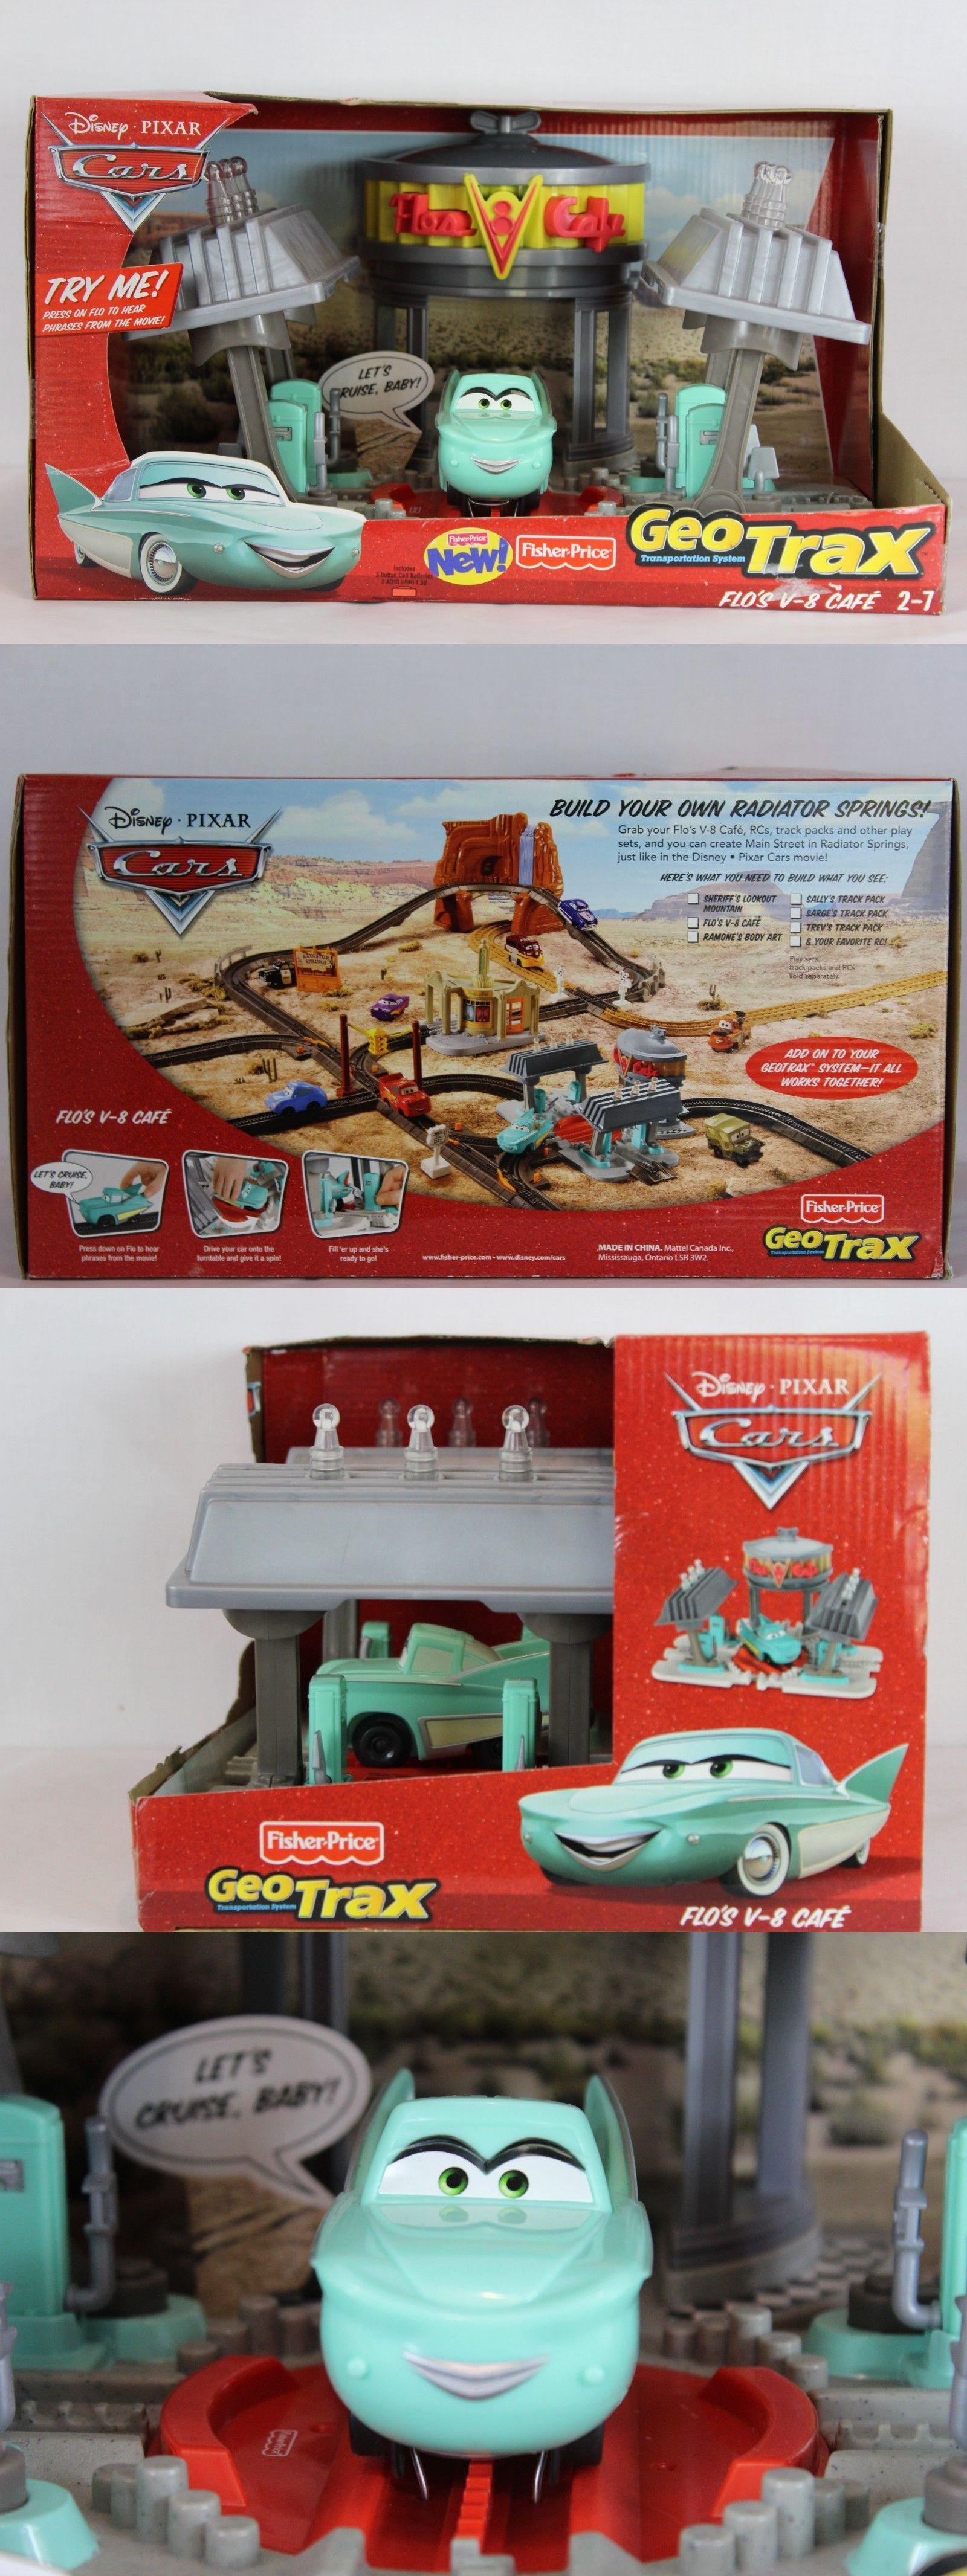 Geotrax 158742 disney pixar cars flo s v 8 cafe geotrax trains toy new